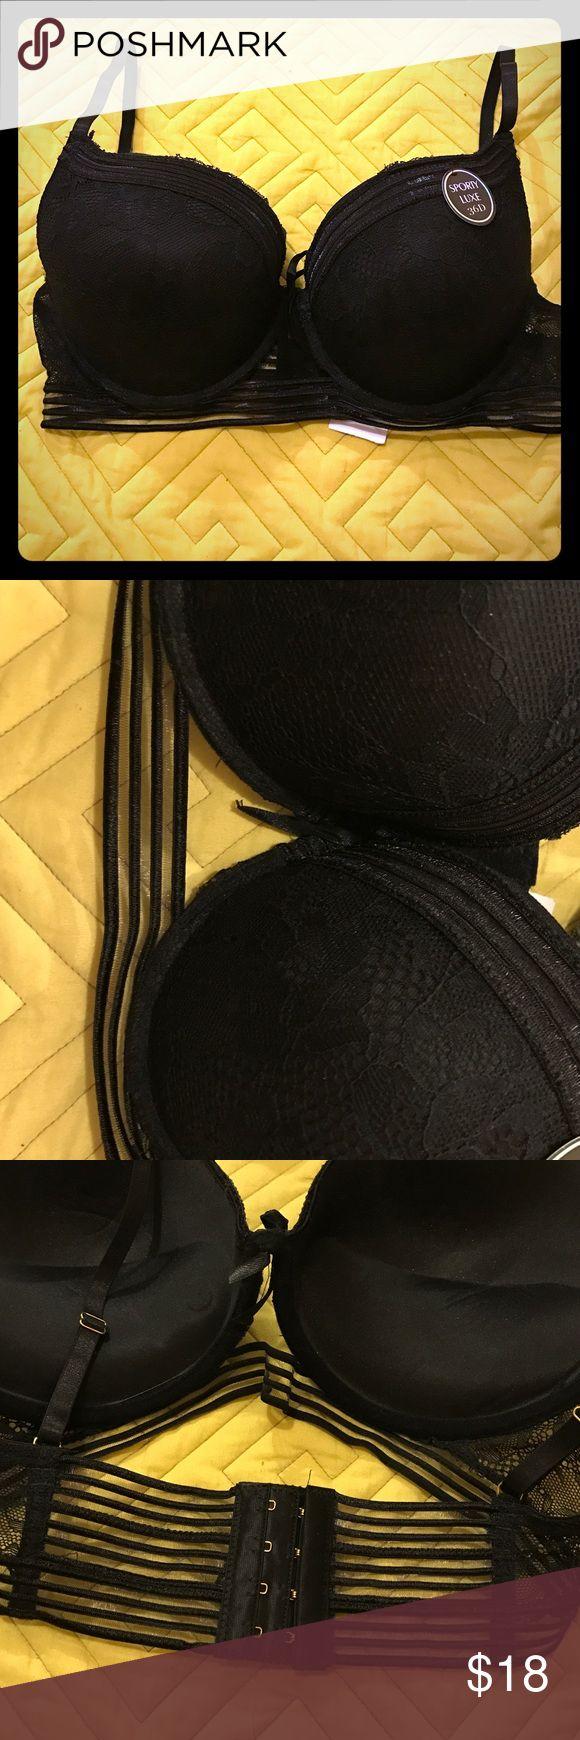 Black bra Size 36D a little big on me. New Intimates & Sleepwear Bras